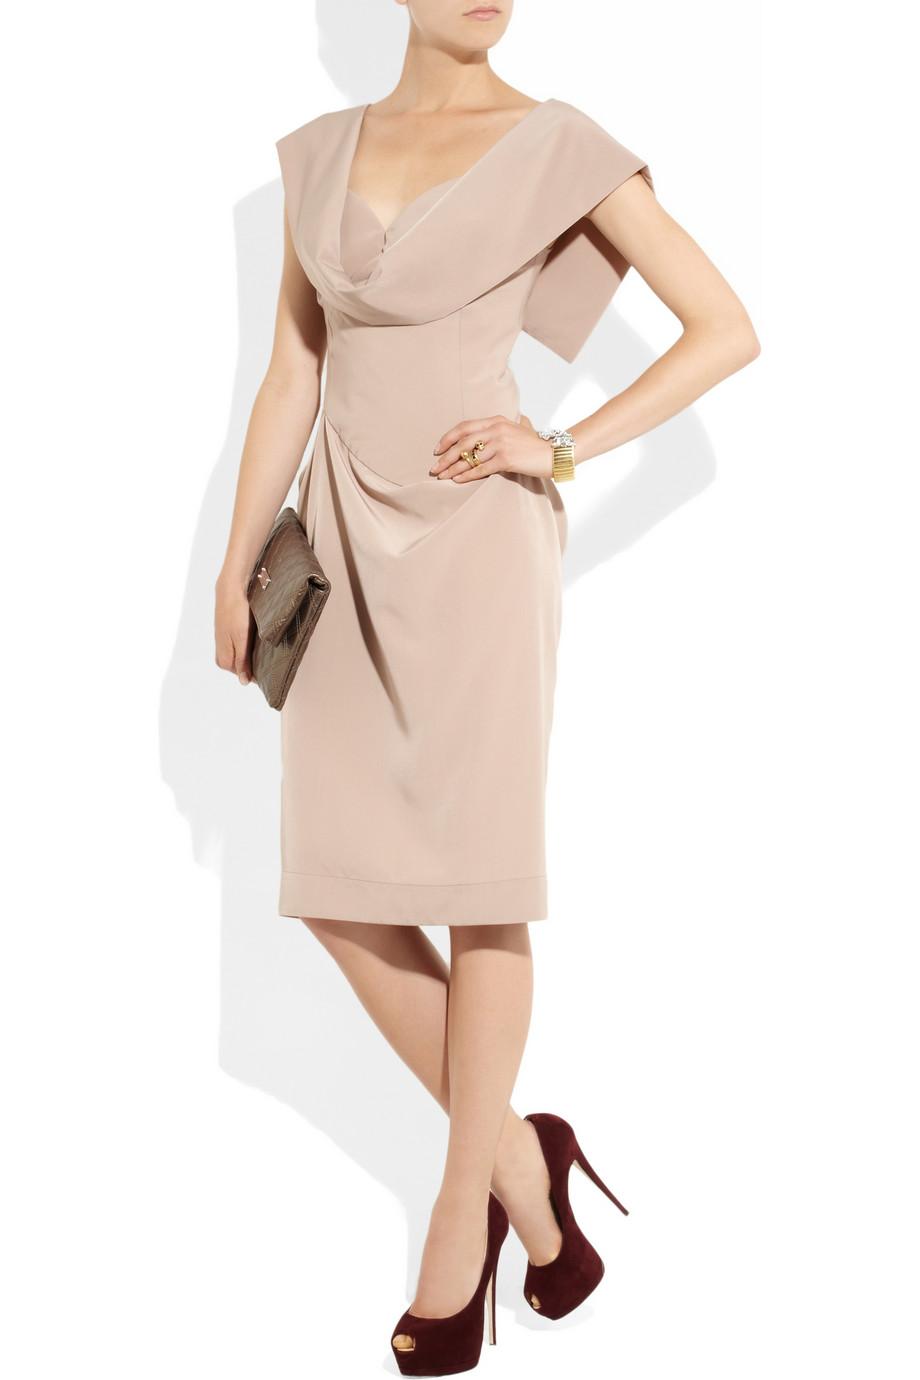 Vivienne Westwood Red Label Crepe De Chine Dress In Pink Lyst